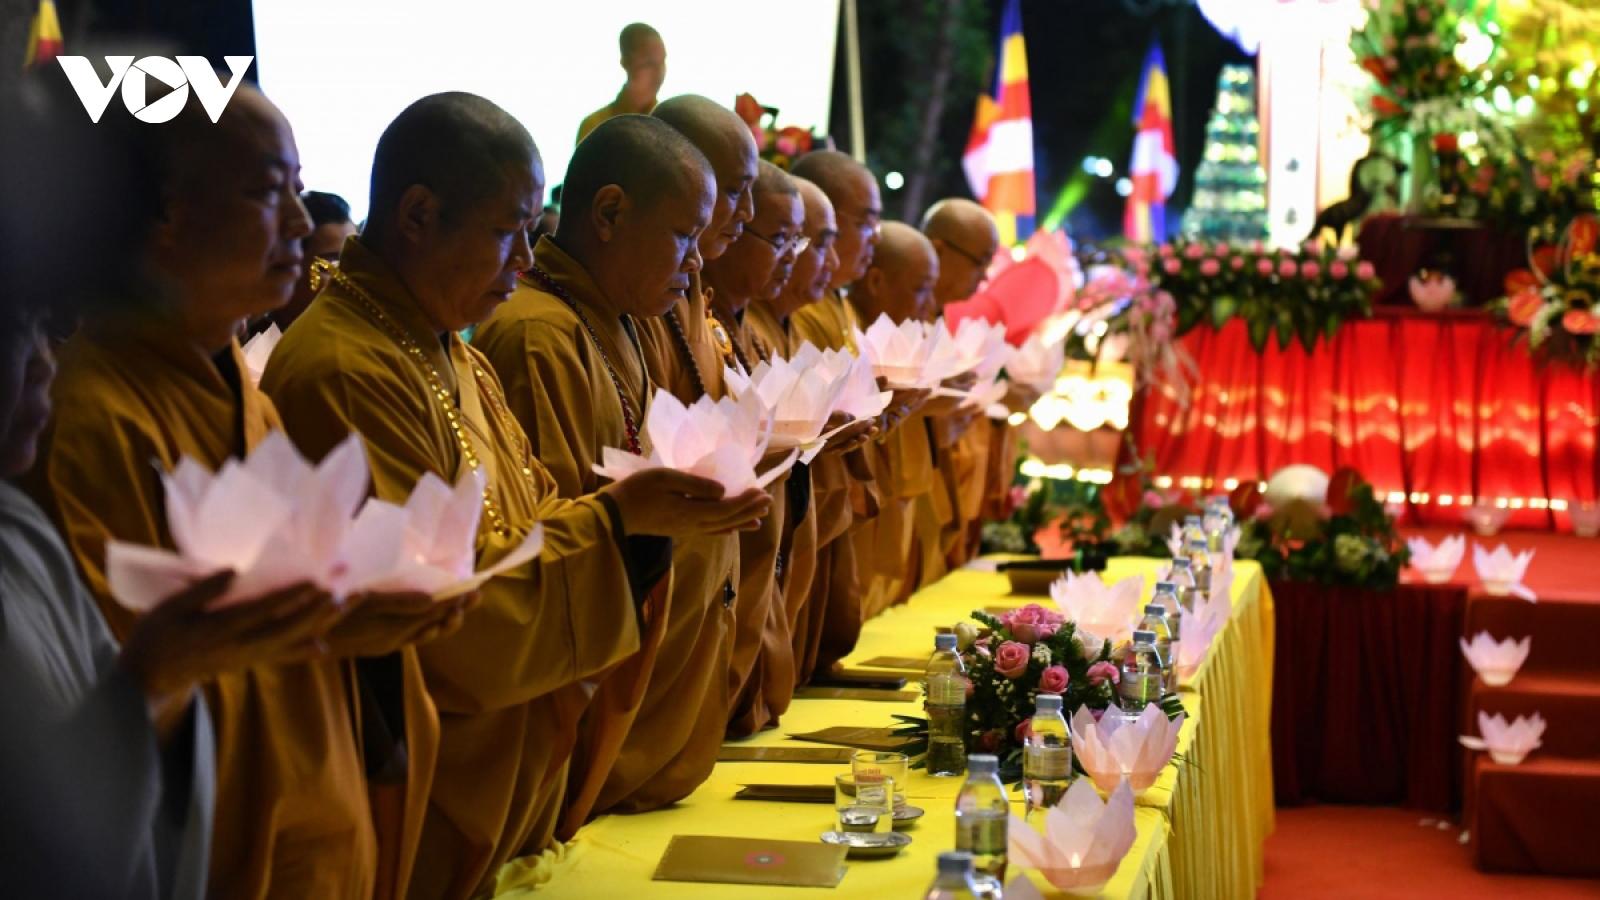 Tran Quoc pagoda hosts lantern festival to celebrate 66th Hanoi Liberation Day